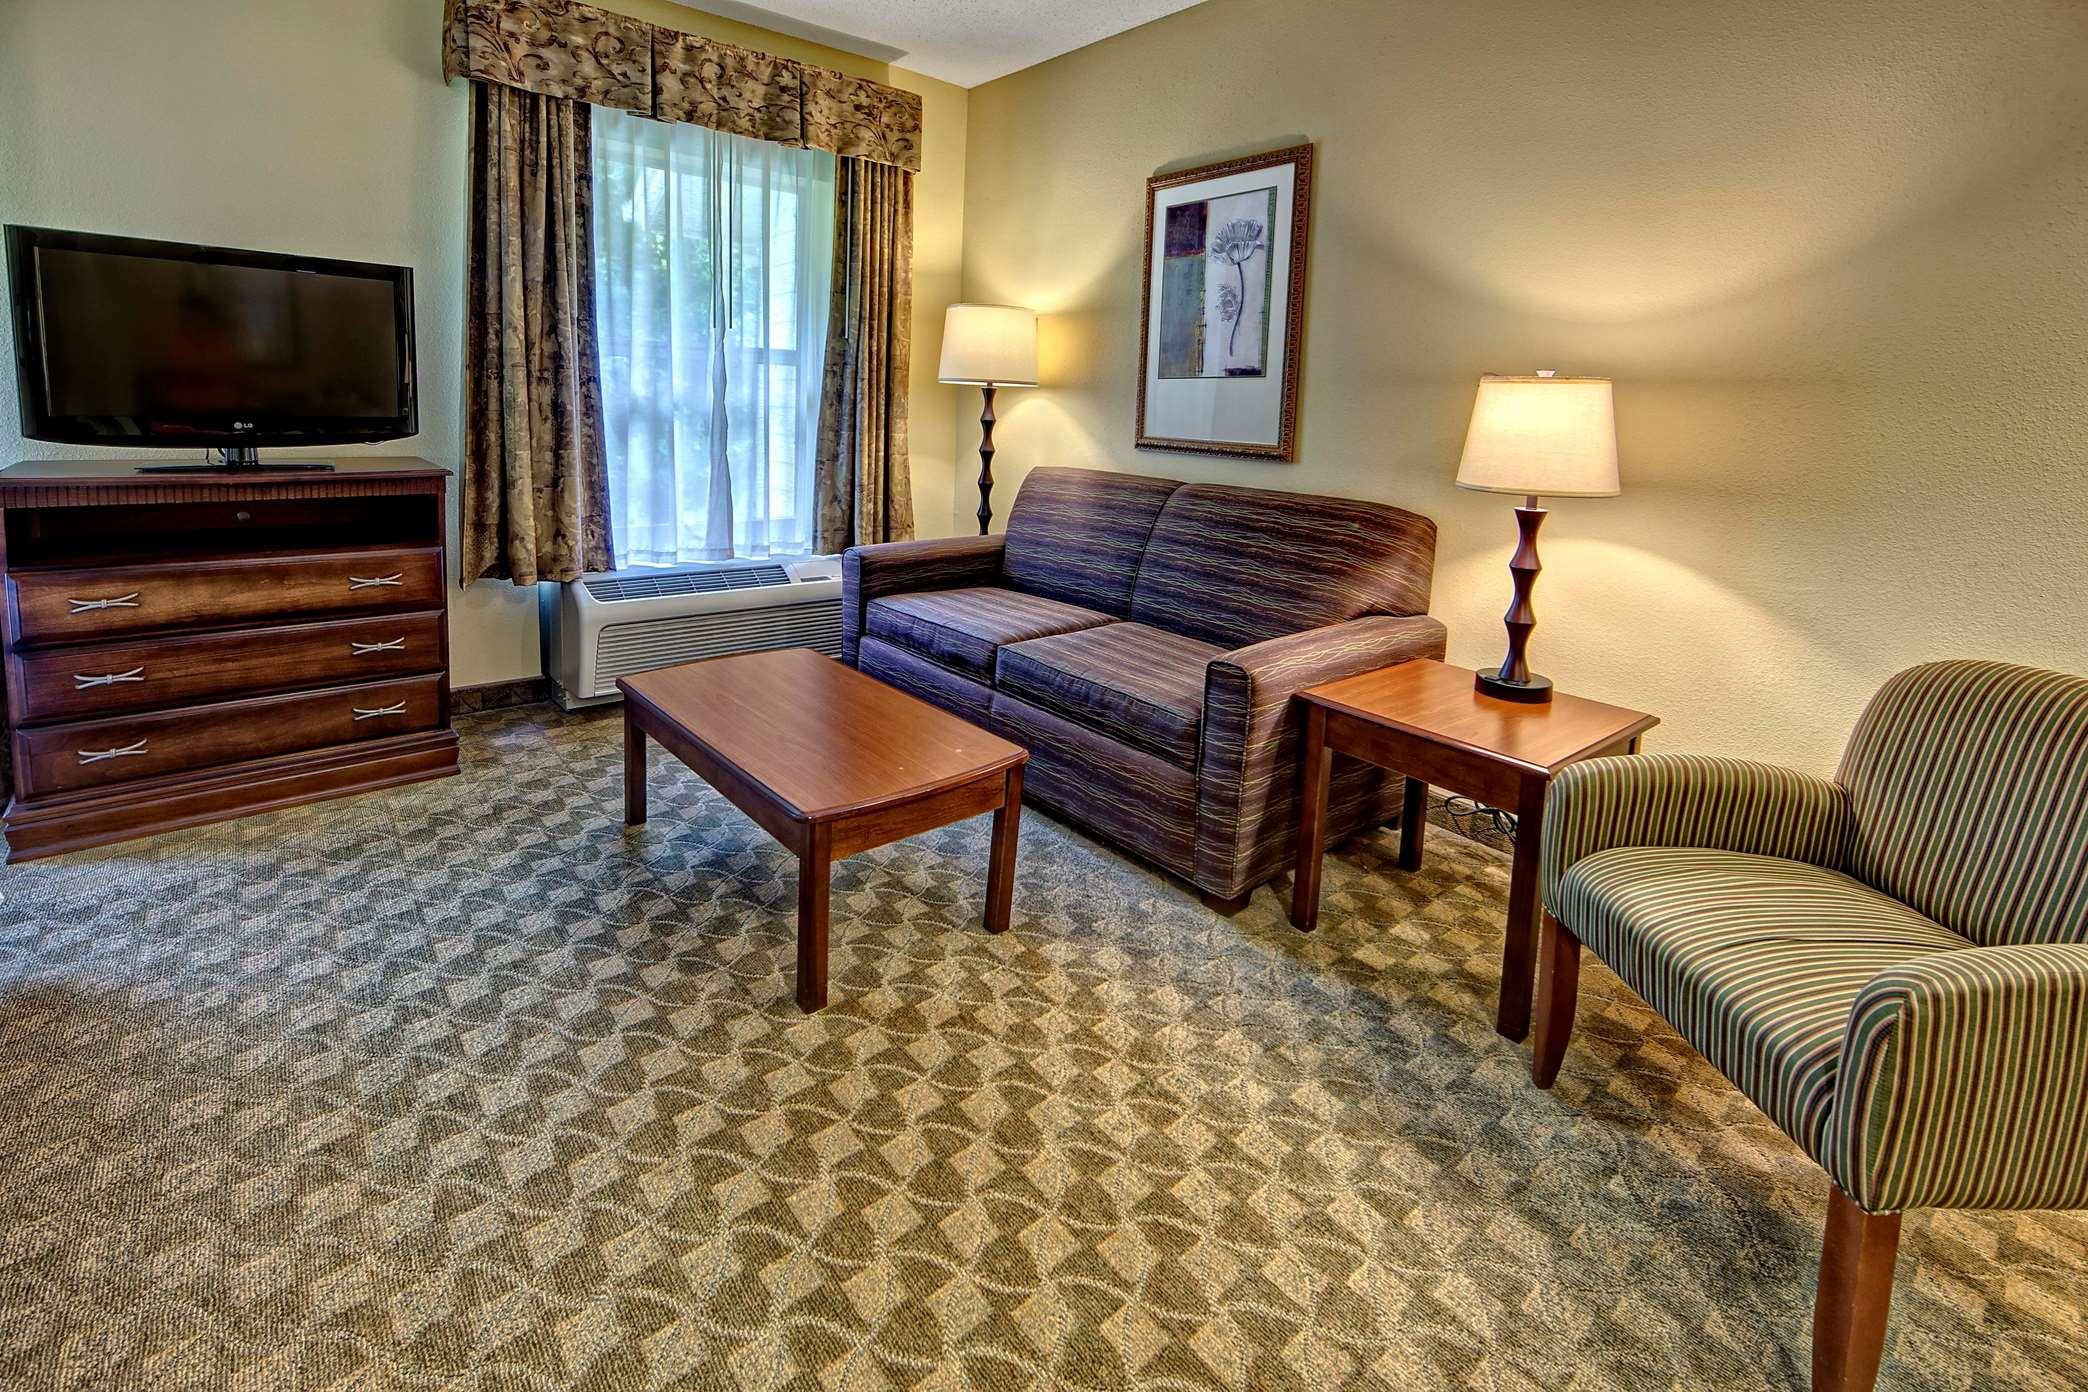 Hampton Inn & Suites Cashiers-Sapphire Valley image 27